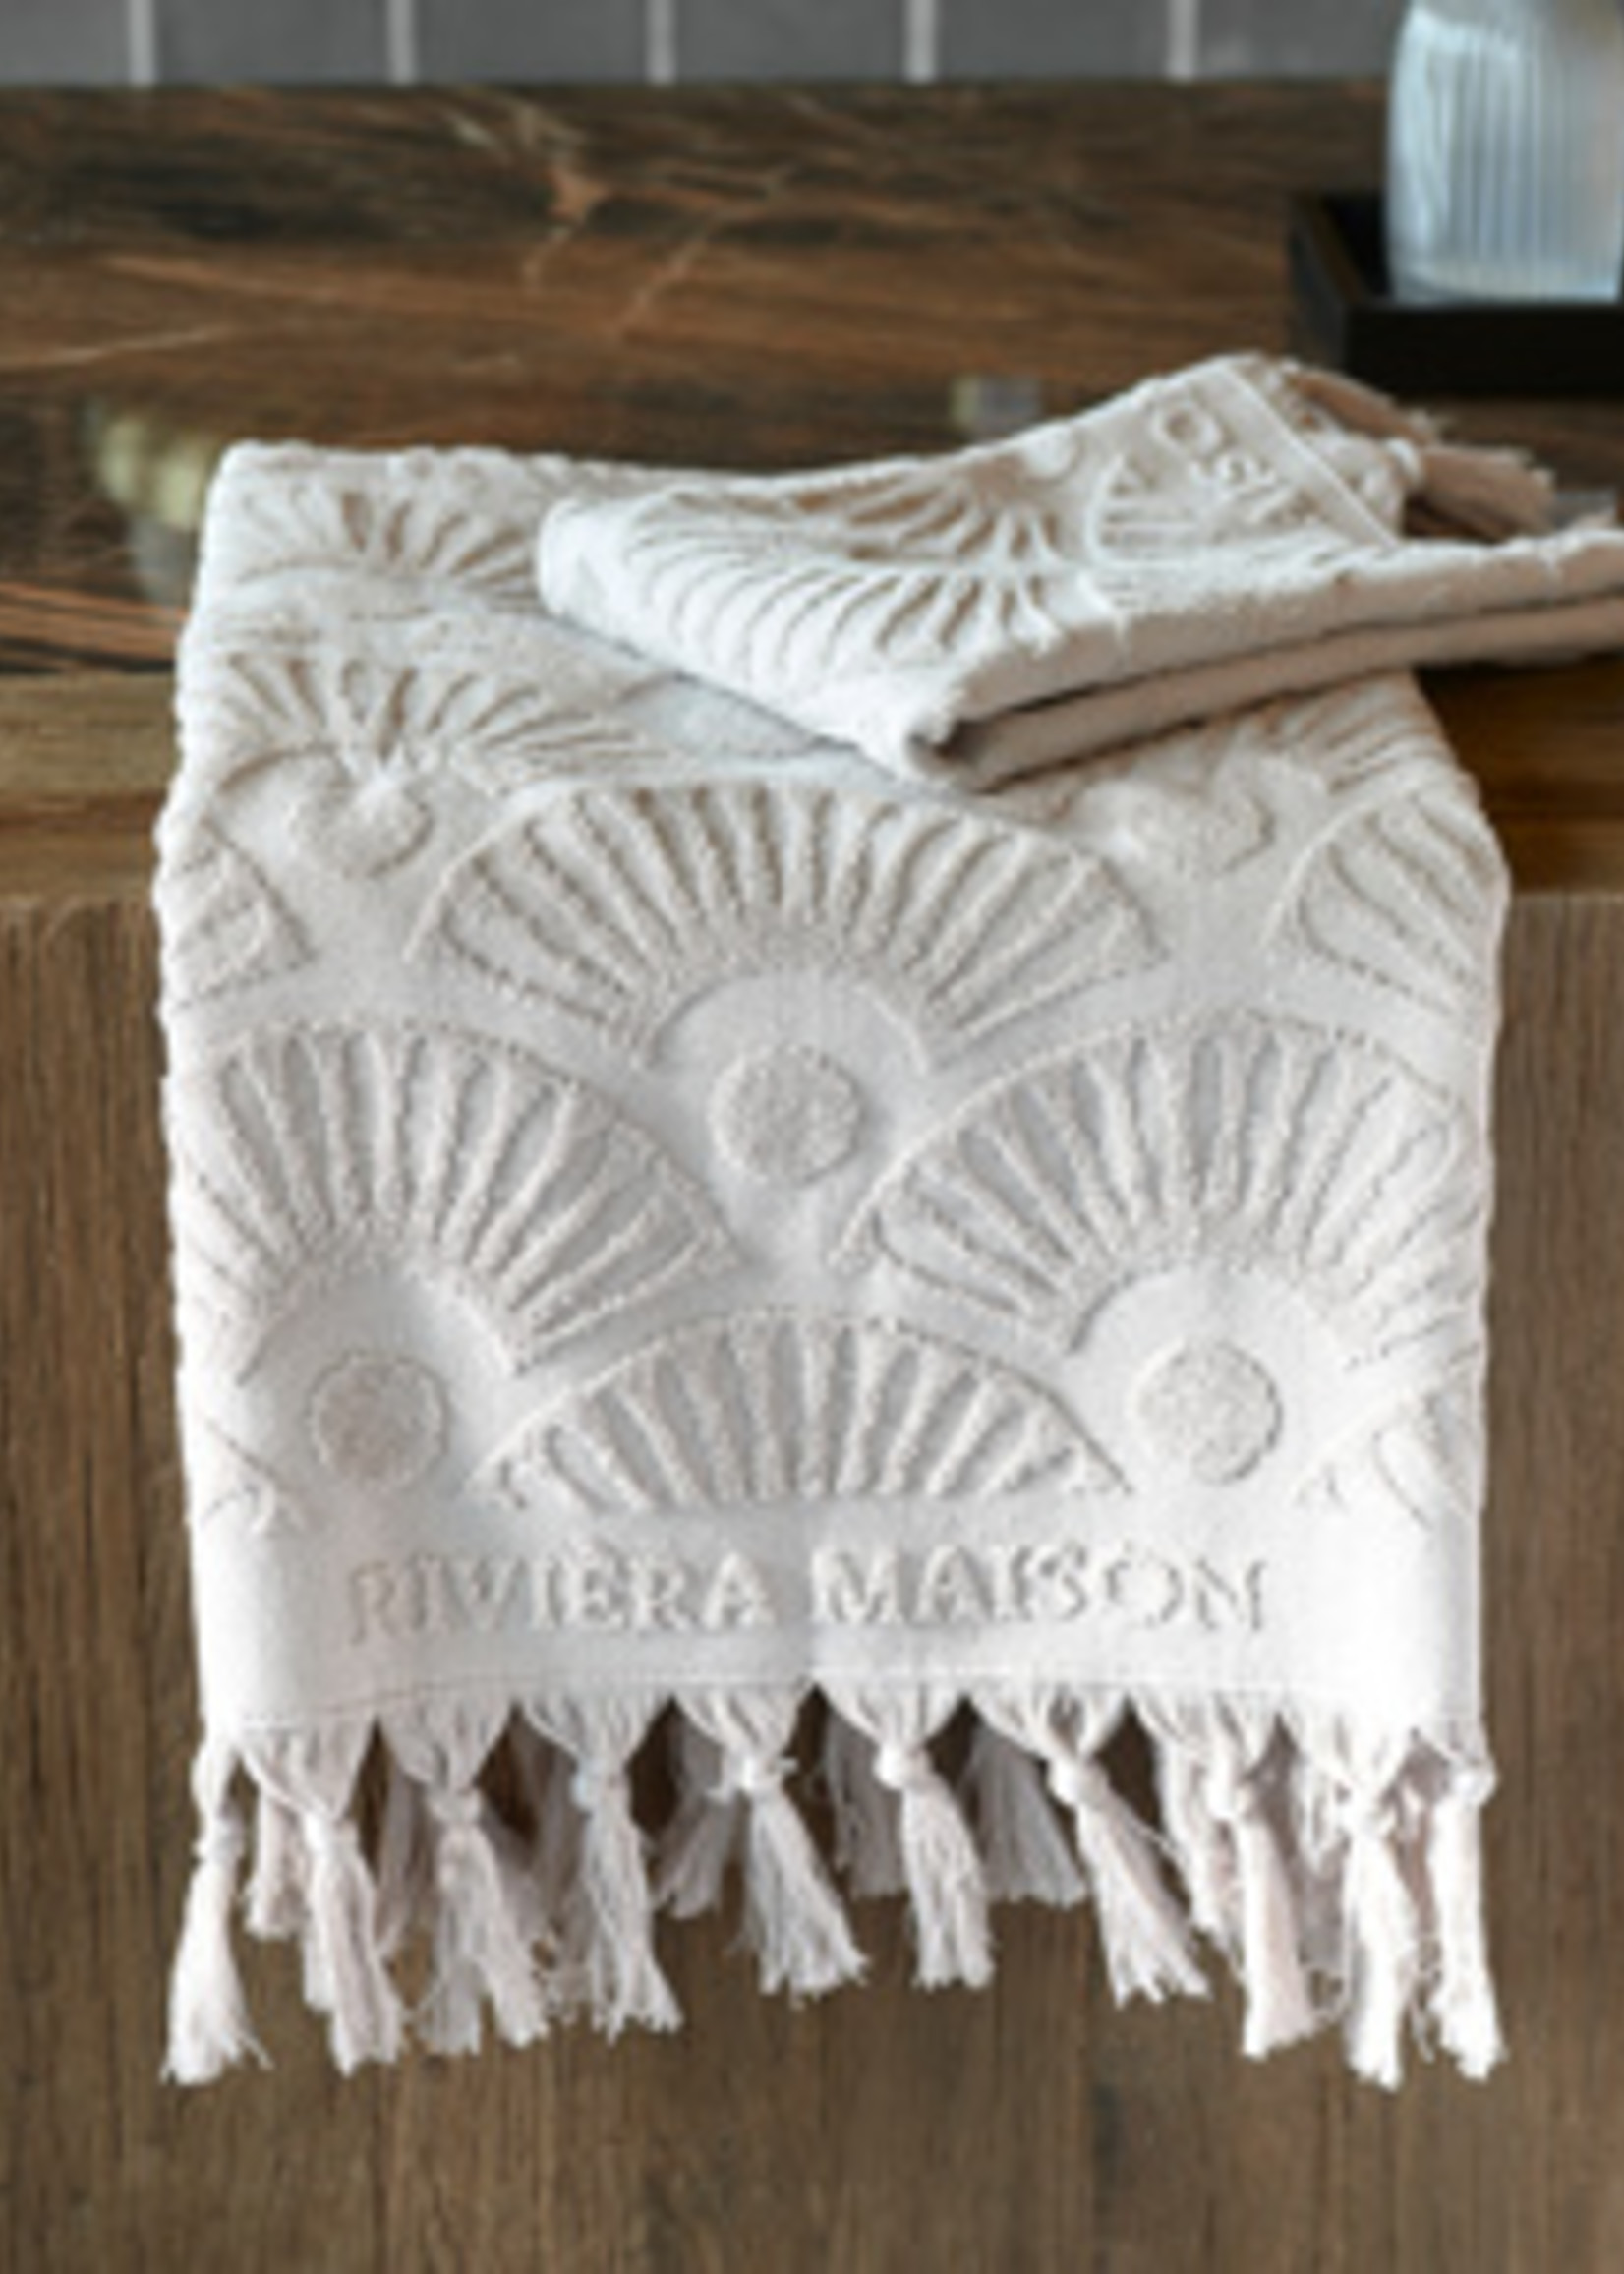 Riviera Maison RM Wave Towel sand 100x50